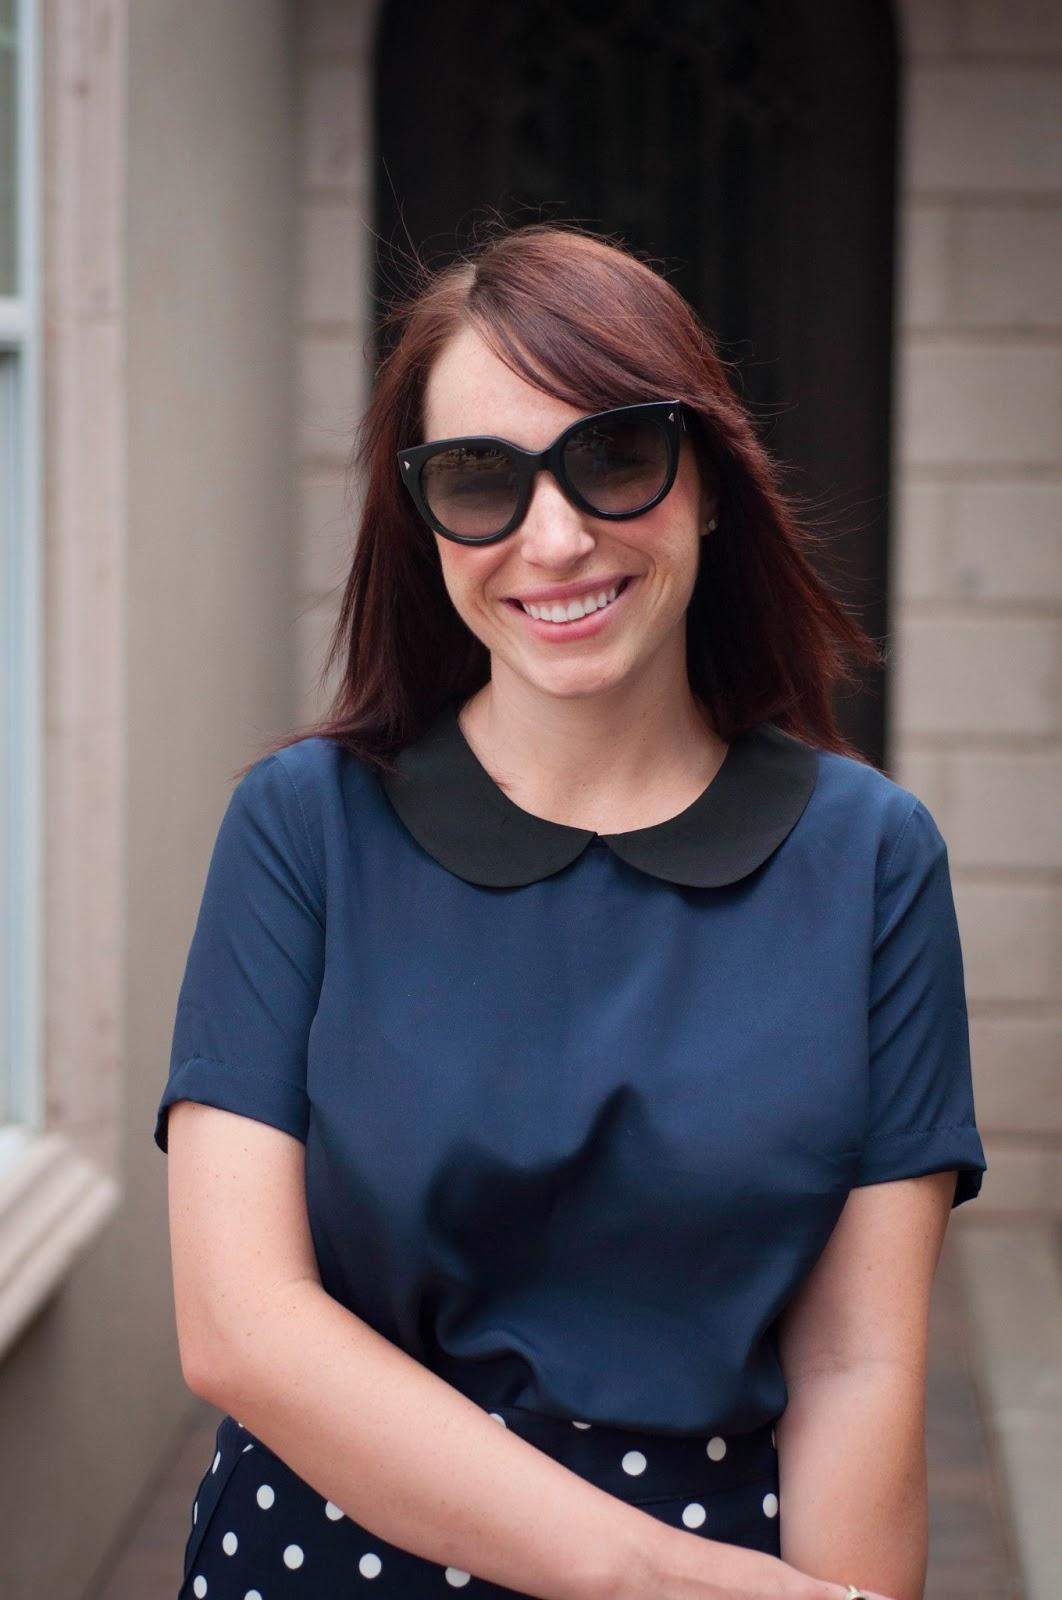 target style, target blouse, peter pan collar, polka dot pencil skirt, fashion blog, style blog, ootd, prada cats eye sunglasses